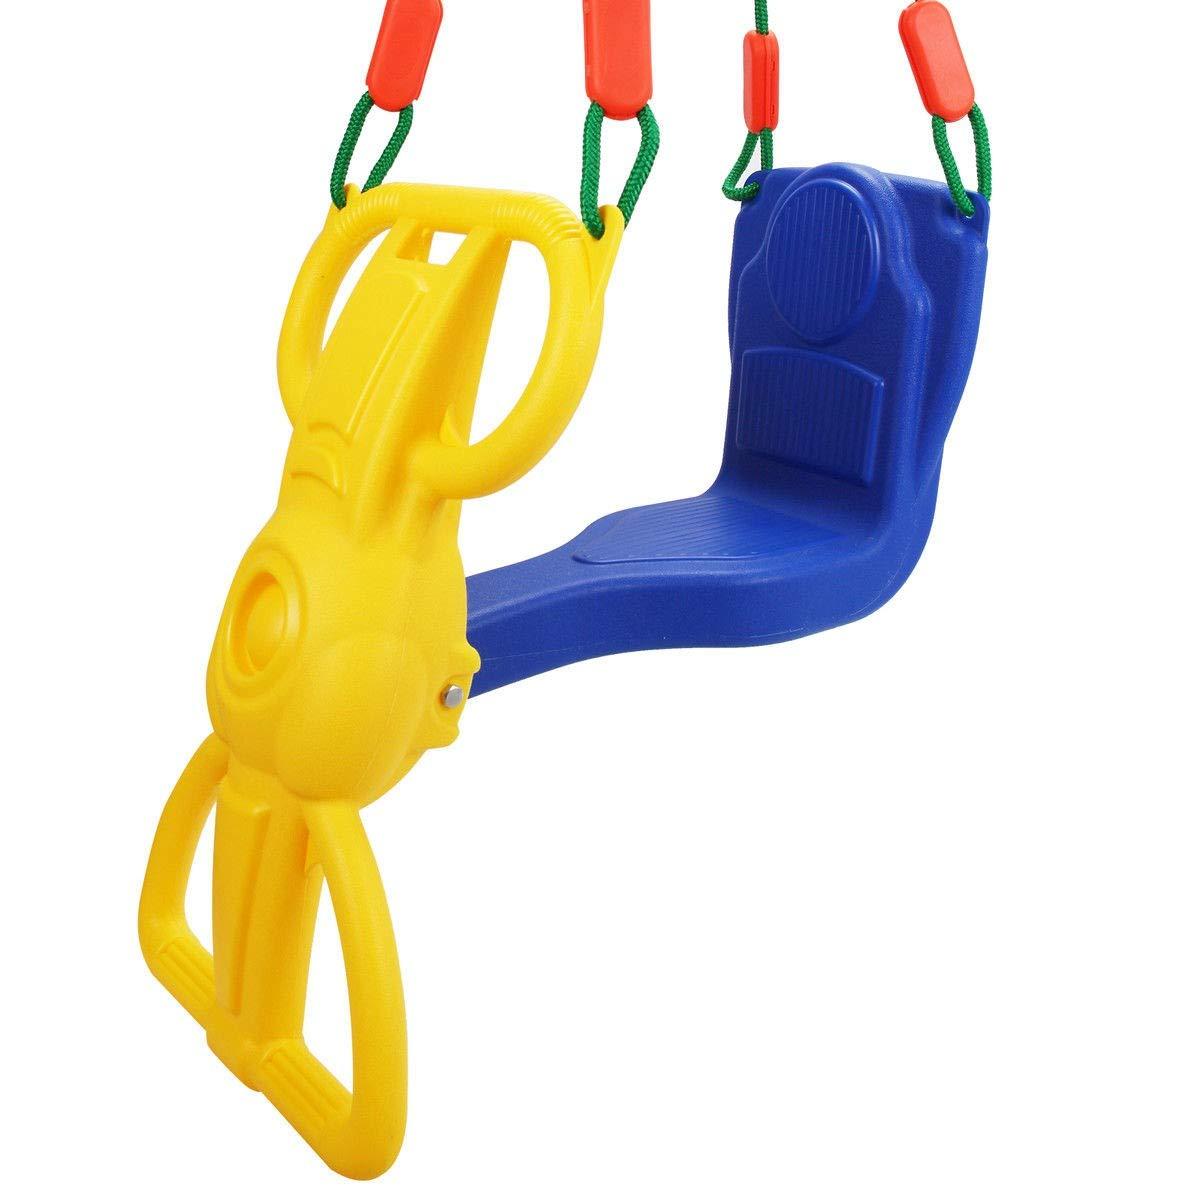 Backyard Kids Rider Glider Swing with Hangers by Apontus (Image #1)